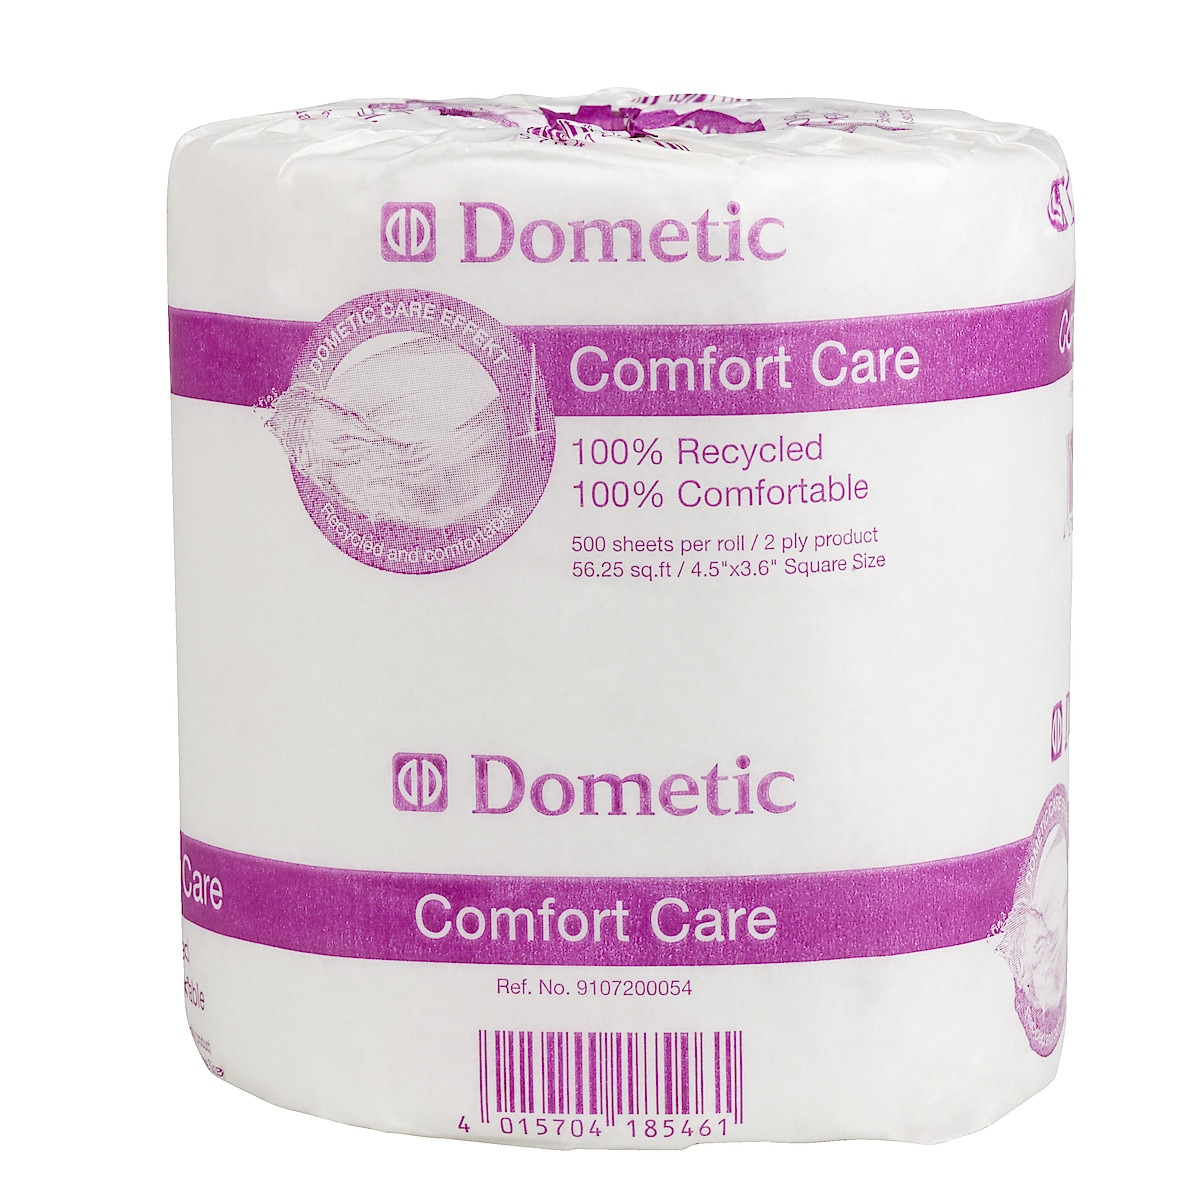 Dometic Comfort Care toalettpapir